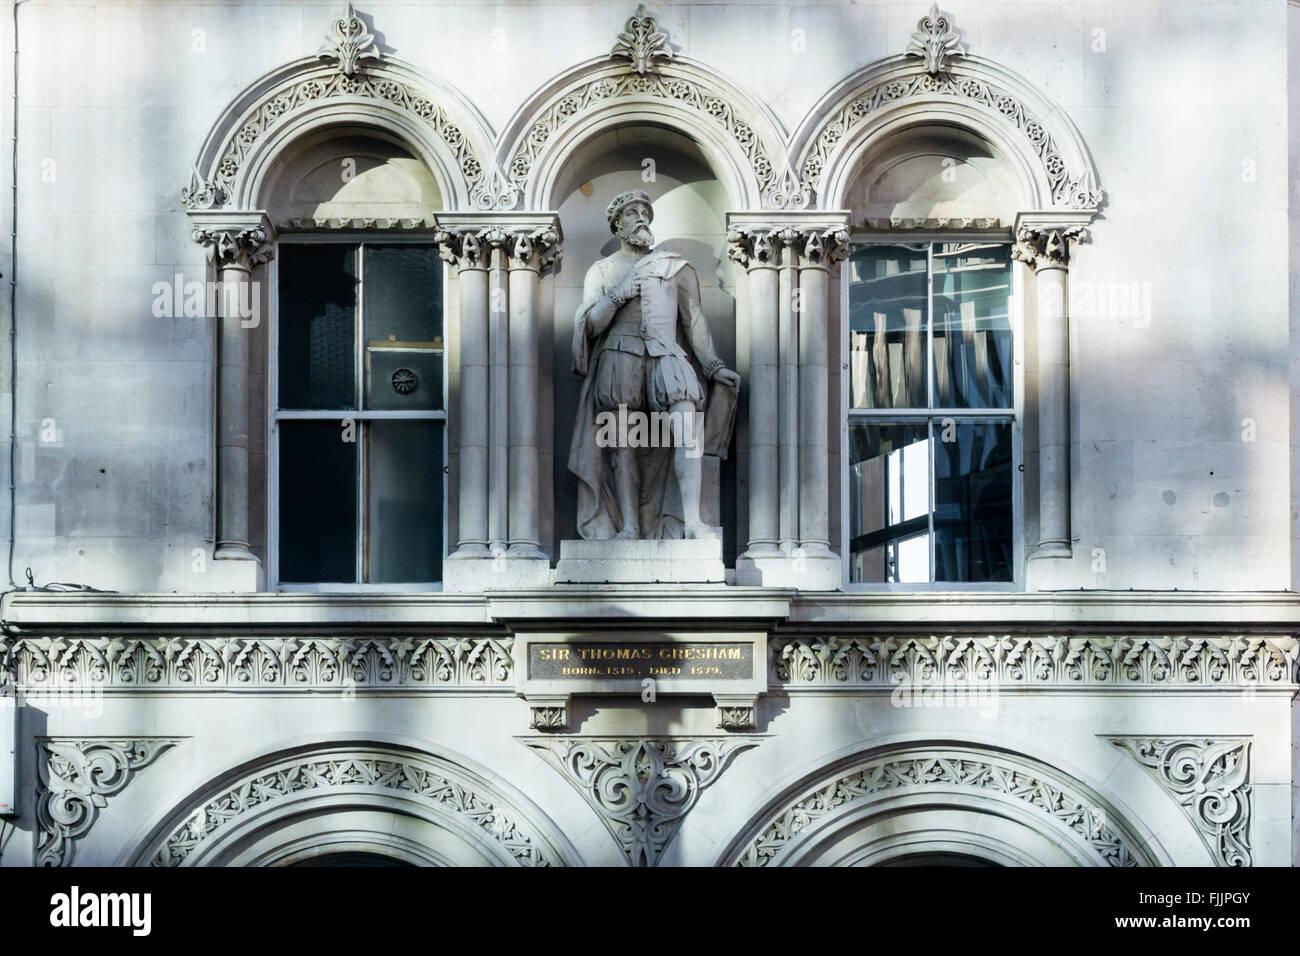 Statue of Sir Thomas Gresham on building at Holborn Viaduct, London. - Stock Image